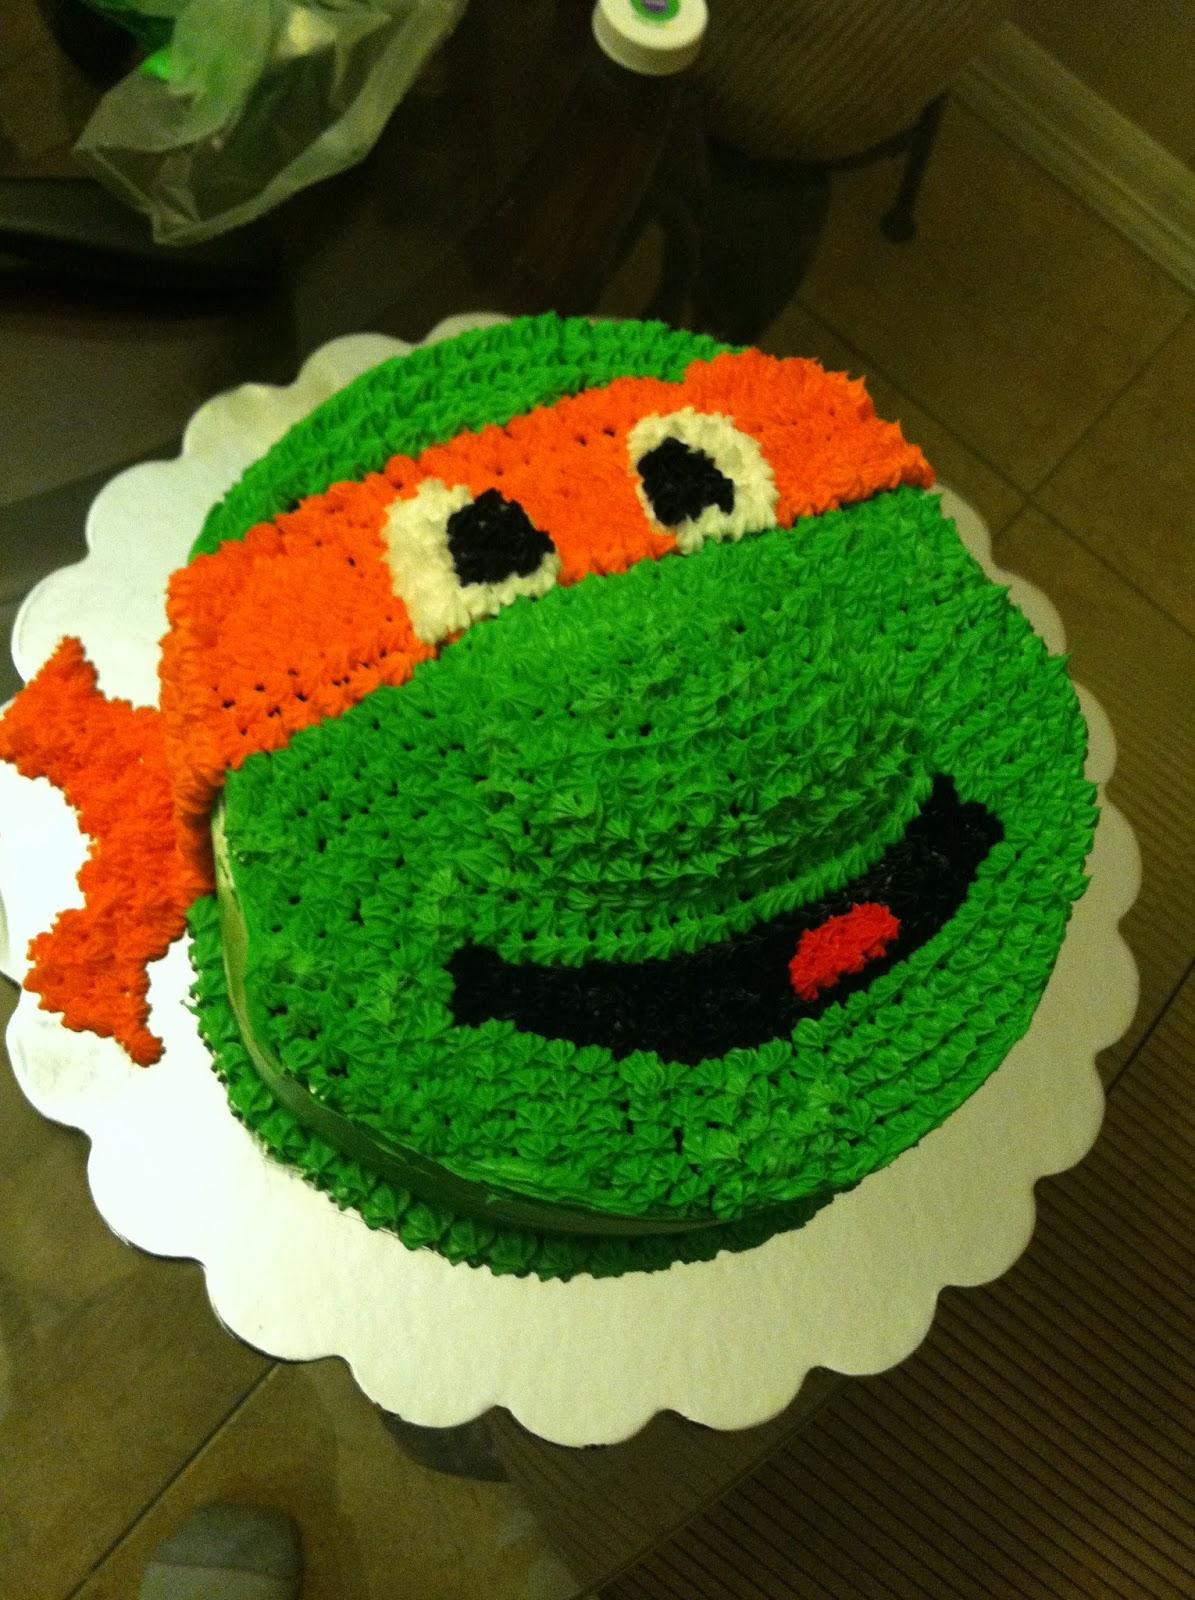 The Classy Cake Ninja Turtle Cake